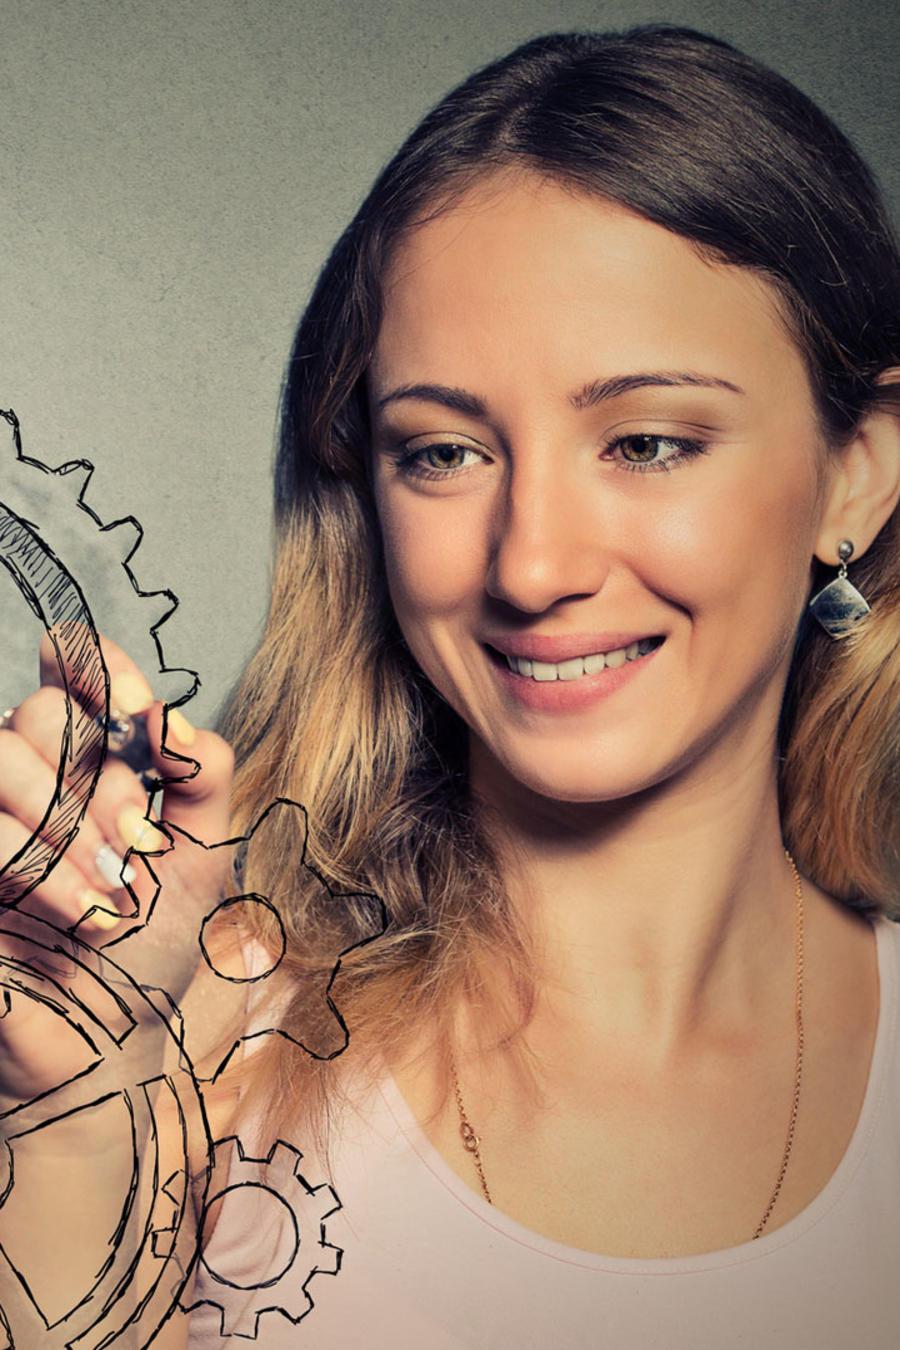 Mujer dibuja engranes